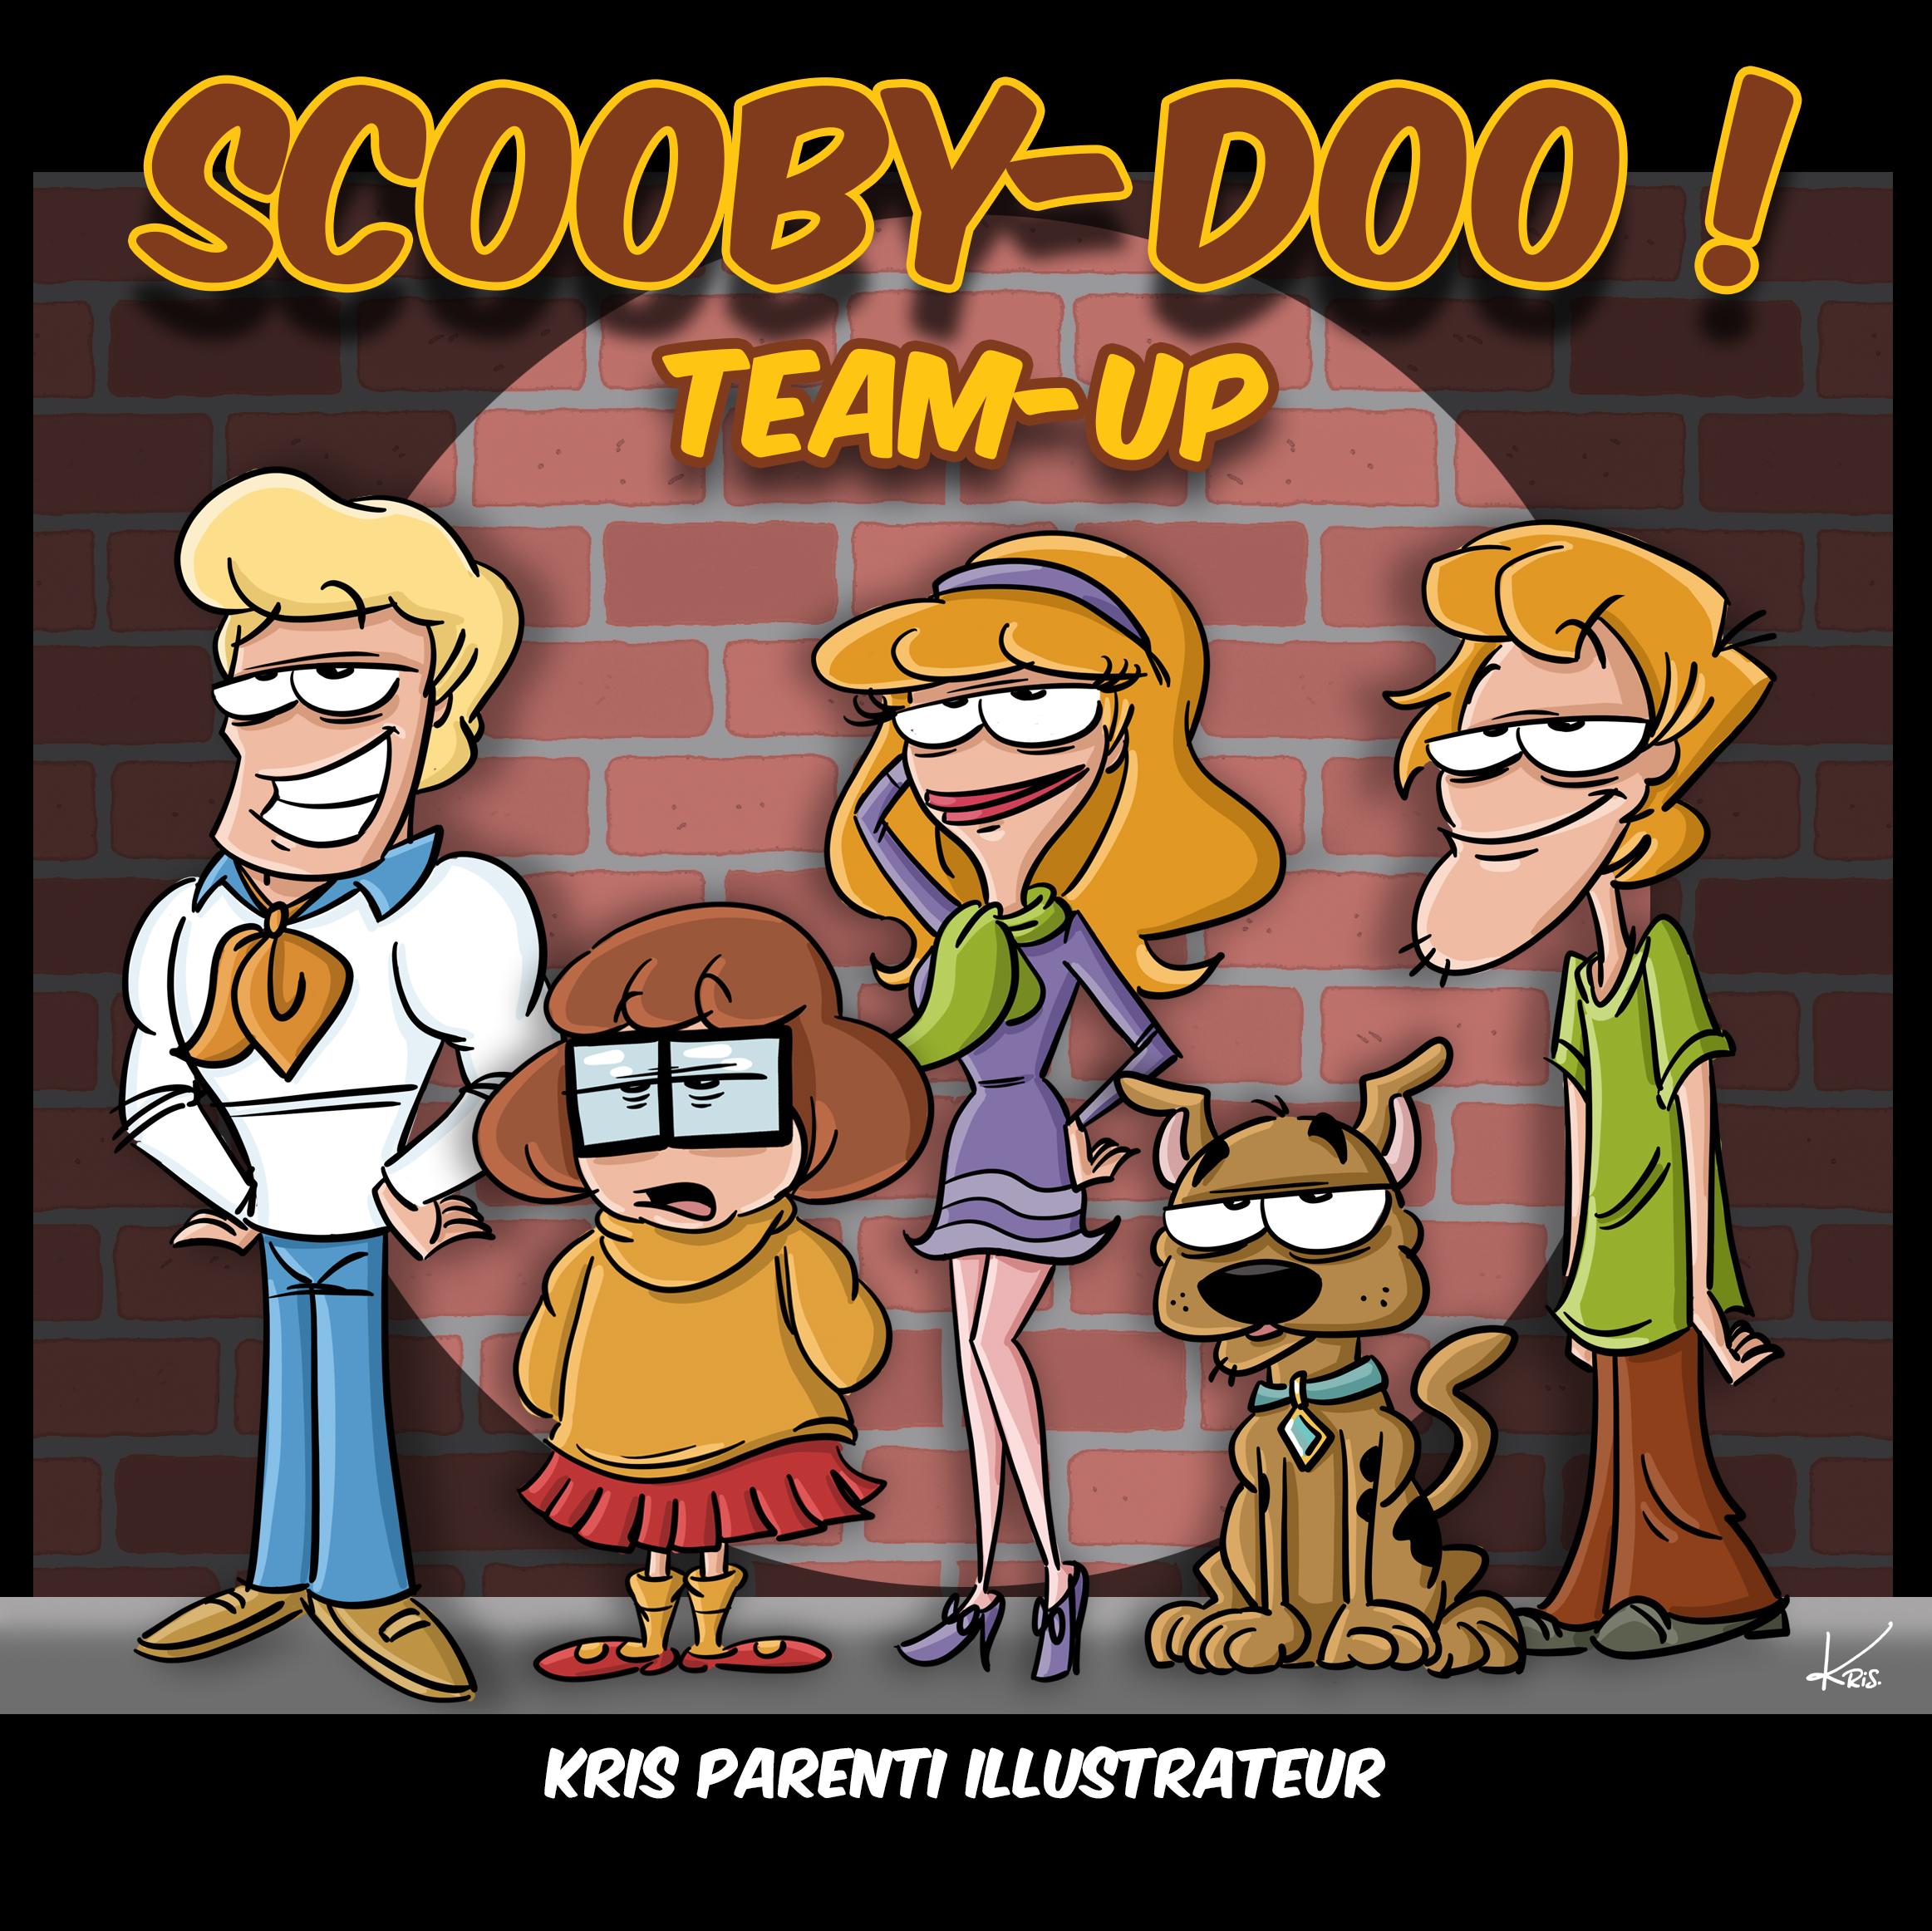 Scooby Doo - Kris Parenti